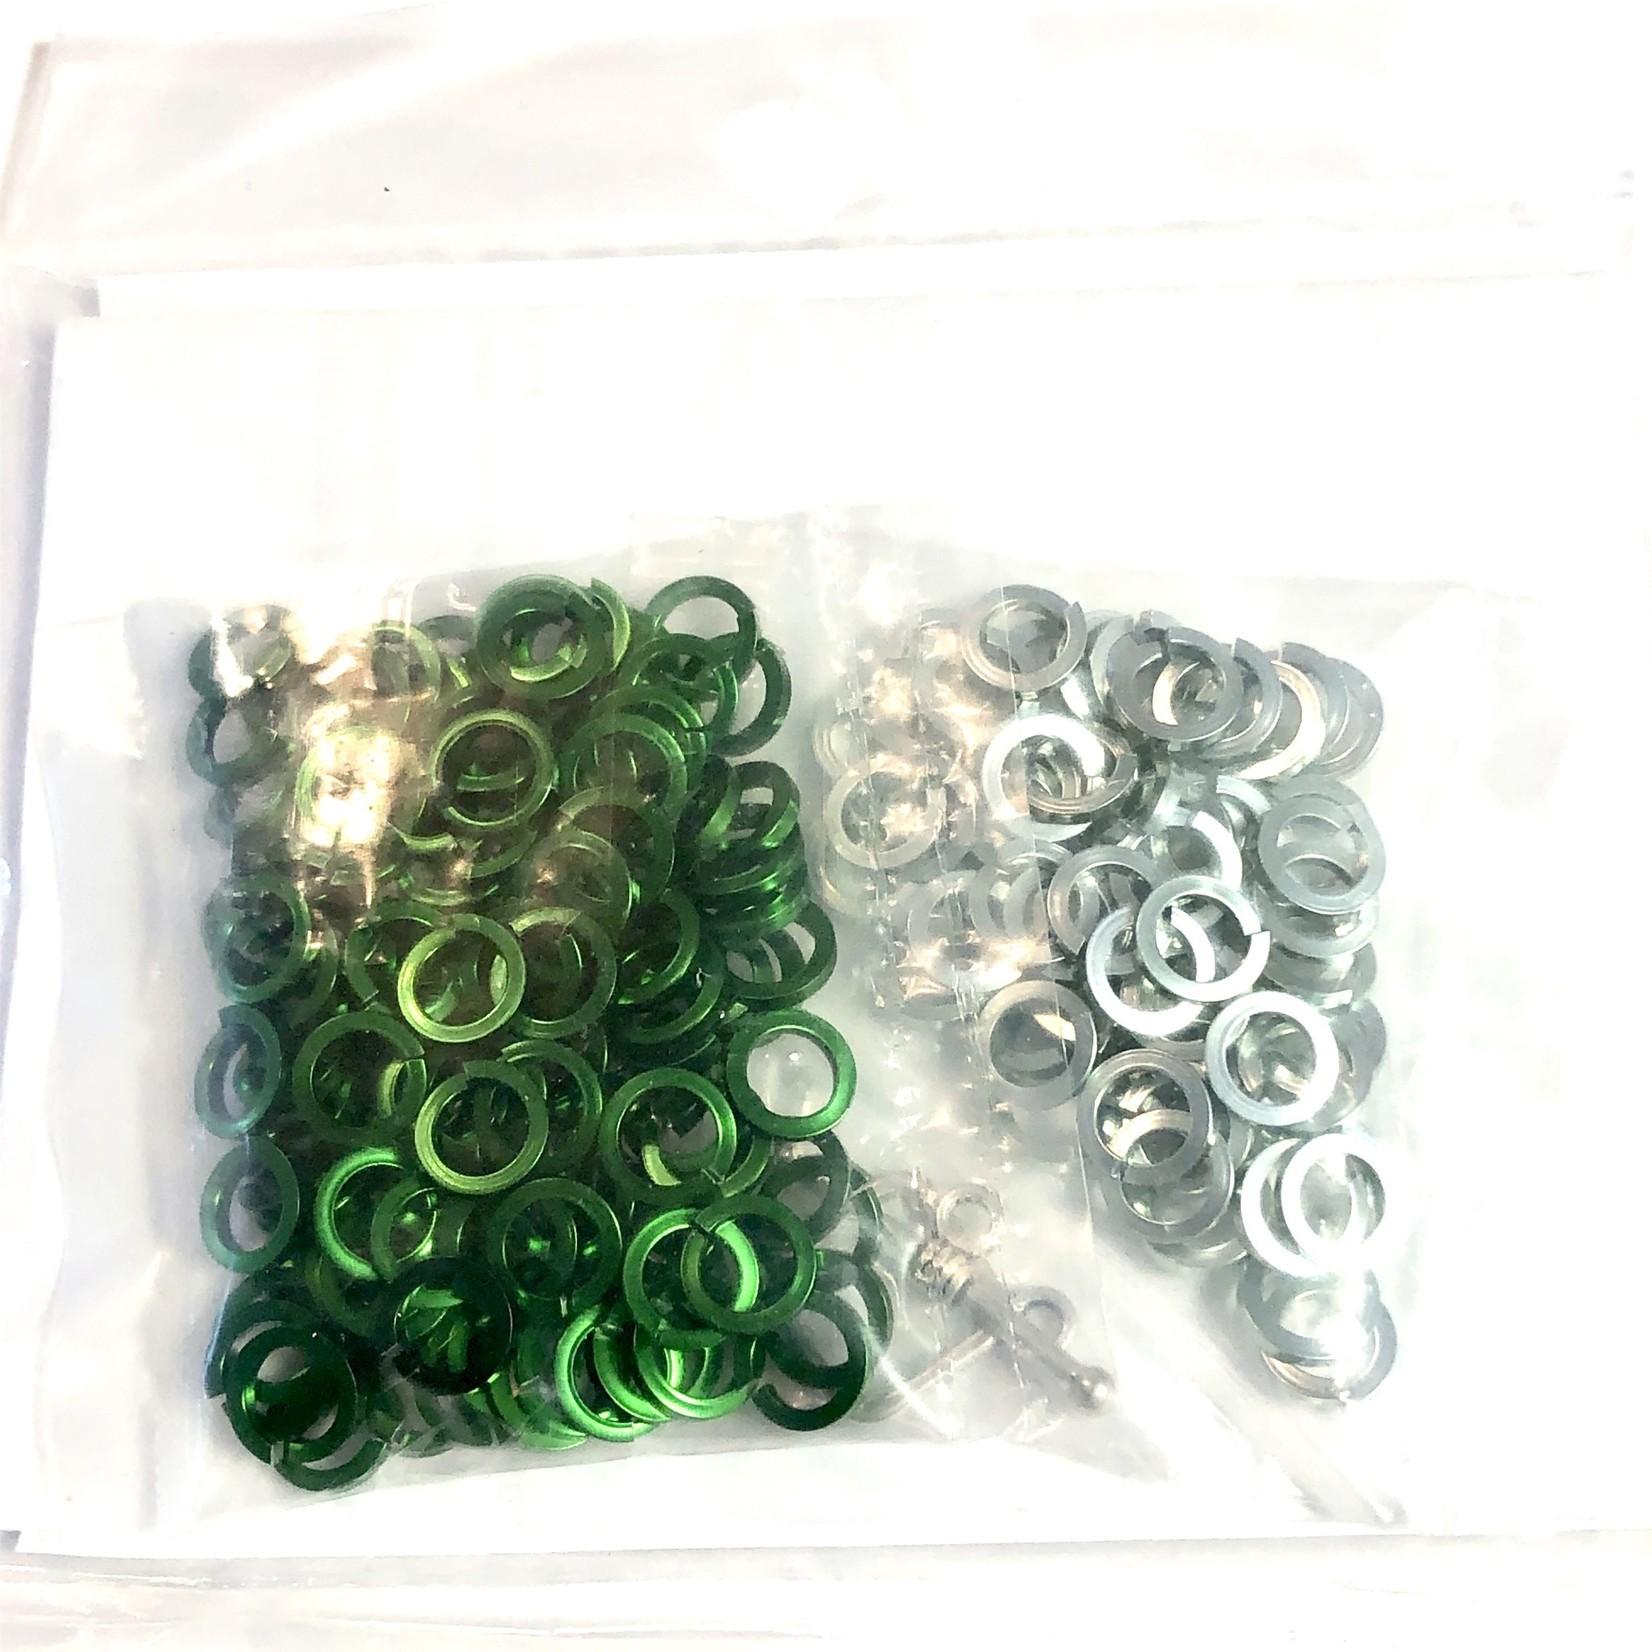 Chain Maille Sq Byzantine Bracelet Kit Green & Seafoam